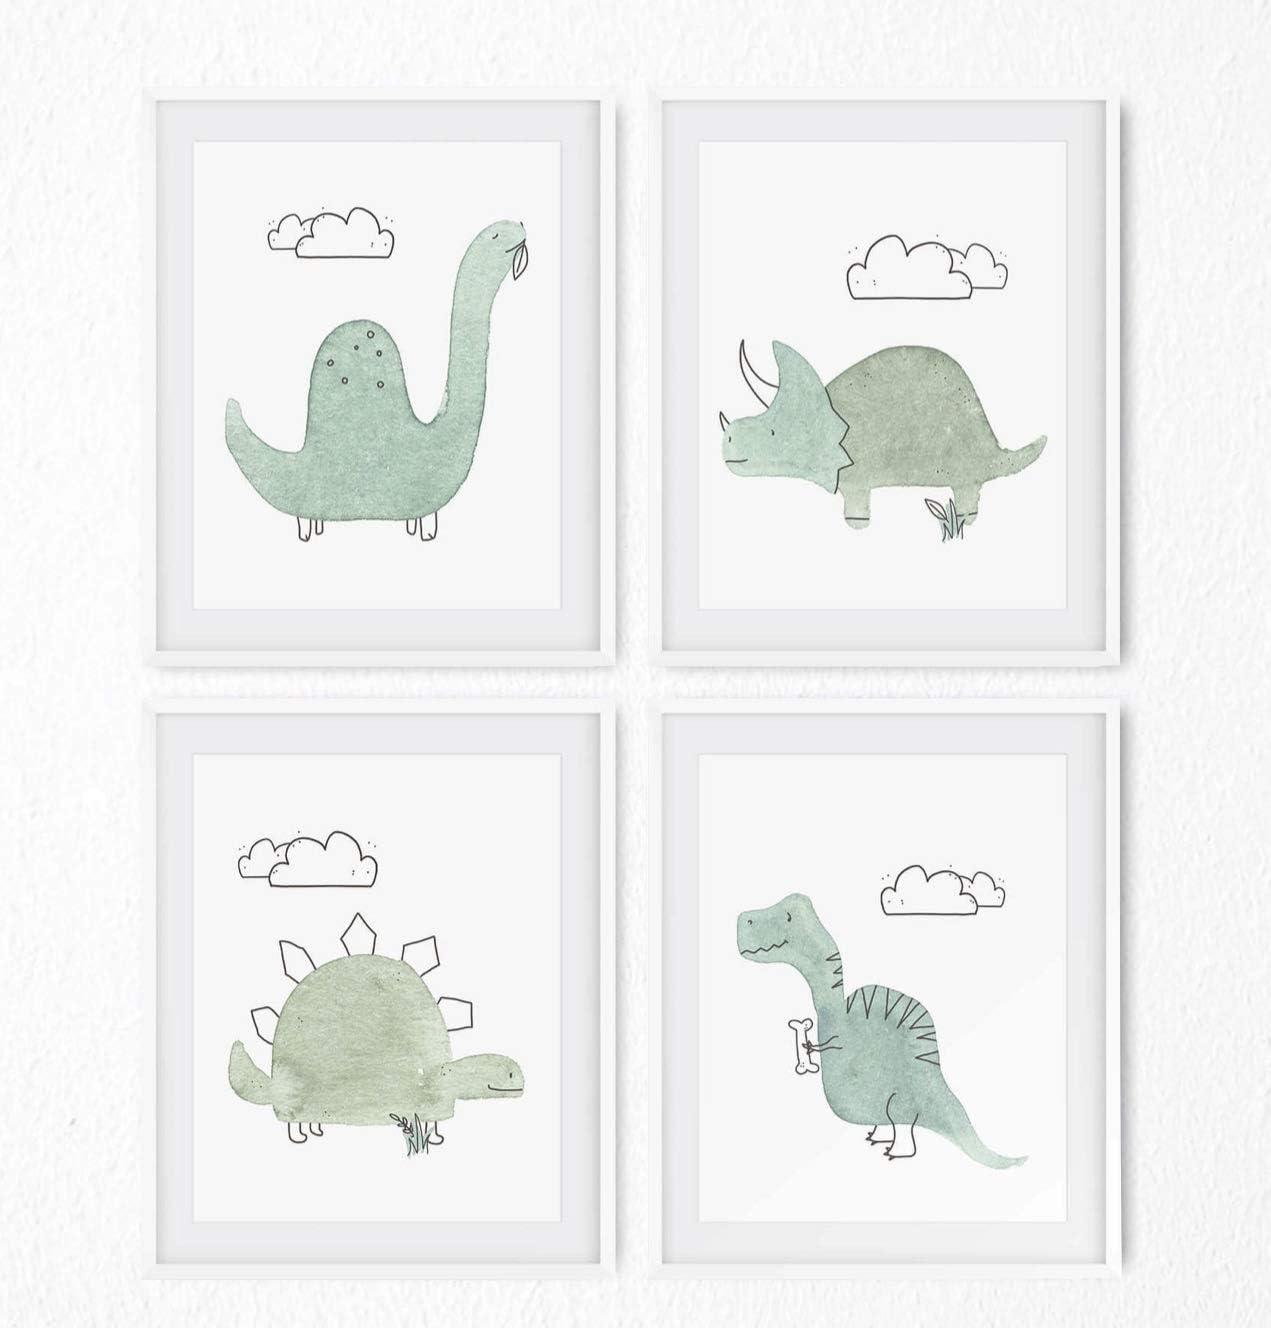 Dinosaur Nursery Decor Set of 4 Wall Prints - Baby Dinosaur Decor for Boys & Girls - Cute Dino Bedroom or Nursery Decorations for Baby Boy & Toddler - 8x10 Inch Unframed Watercolor Art - Baby Shower